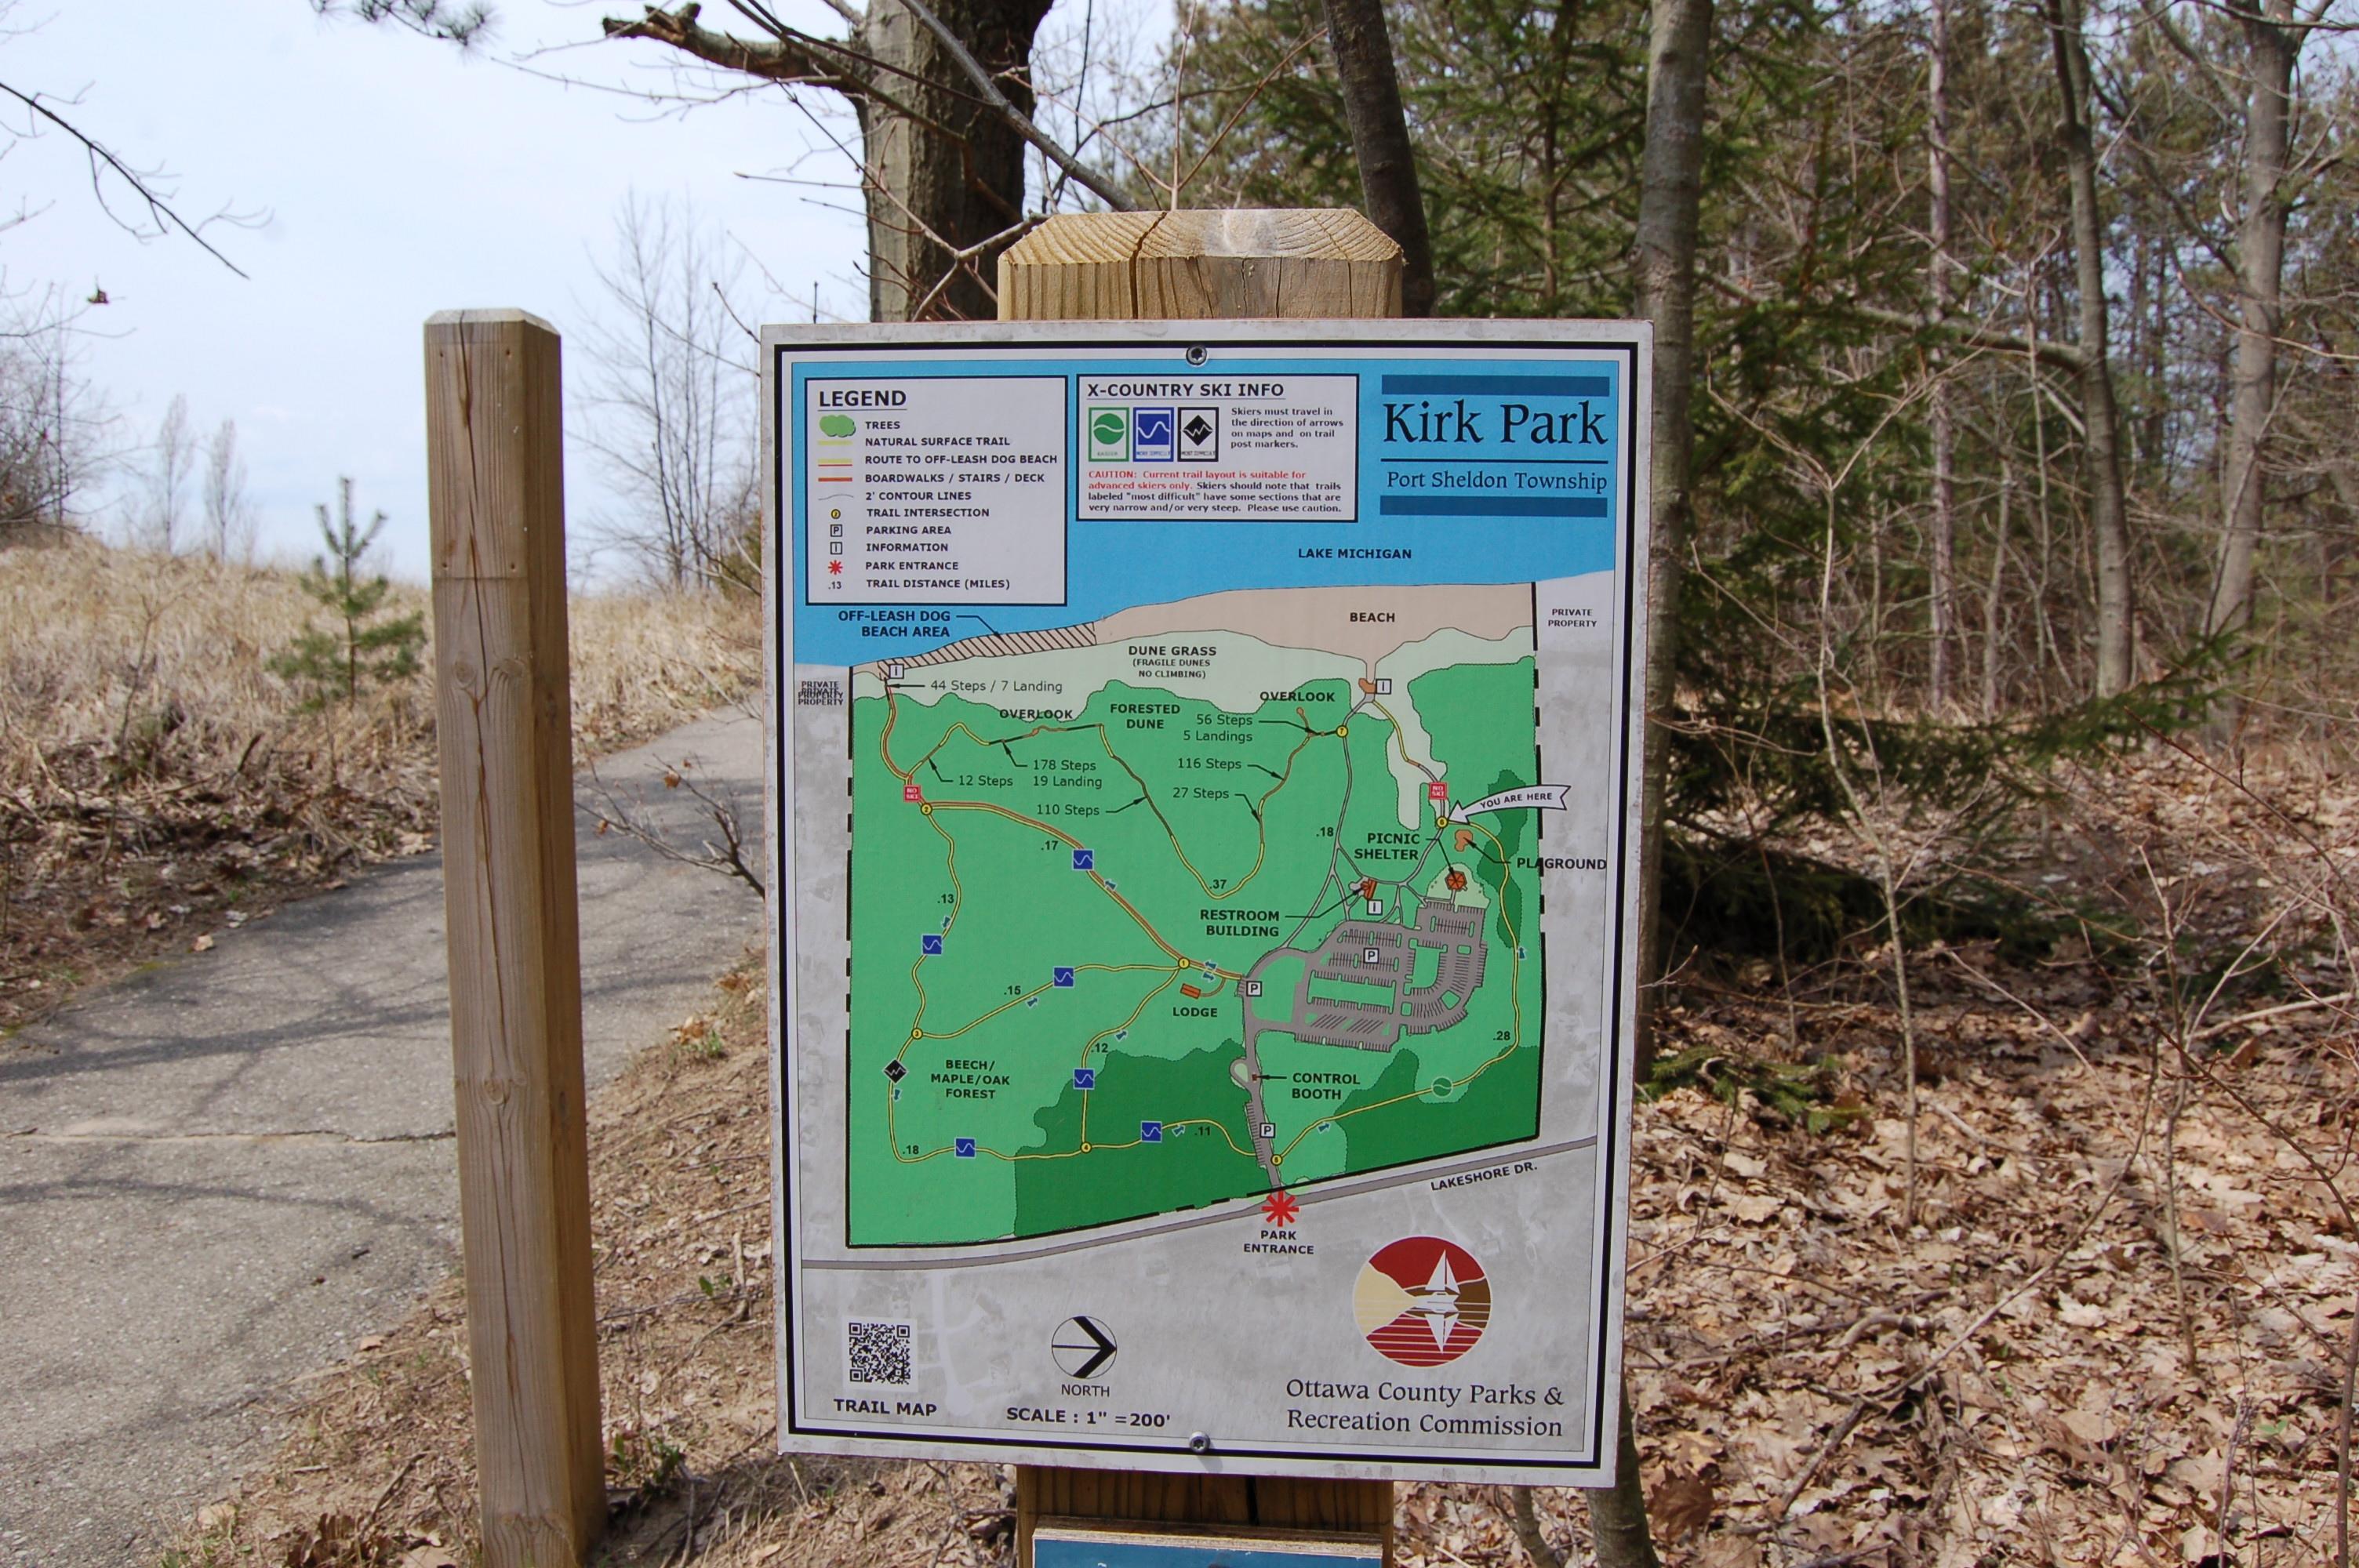 Kirk Park Trail Map